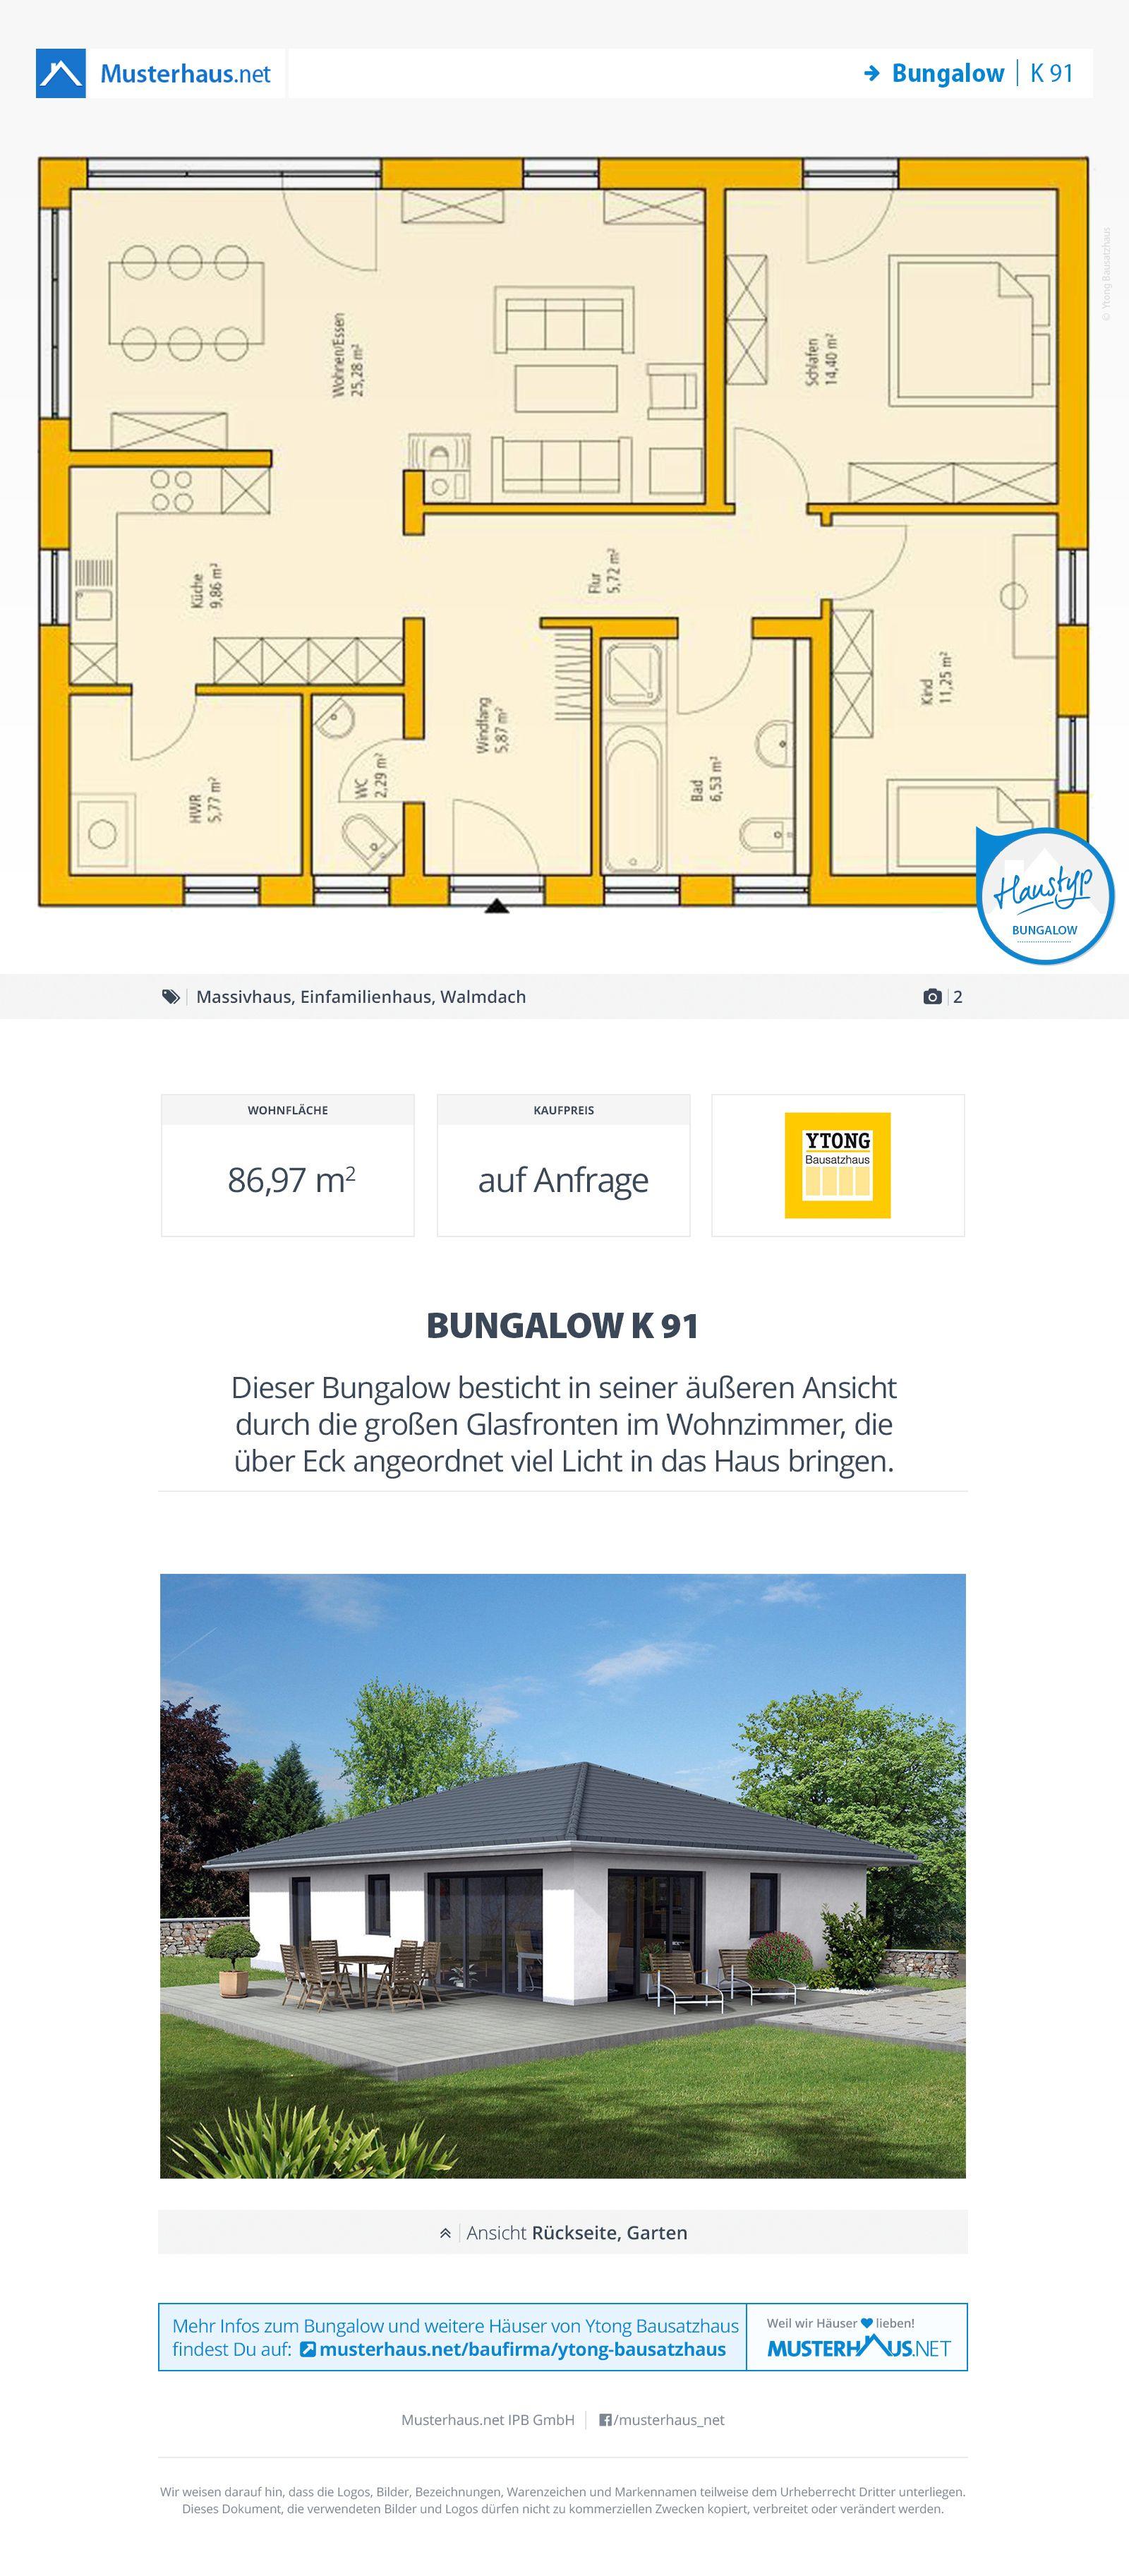 Musterhaus grundriss bungalow  Bungalow Grundriss, 87 m² | Bungalow Grundrisse | Pinterest ...